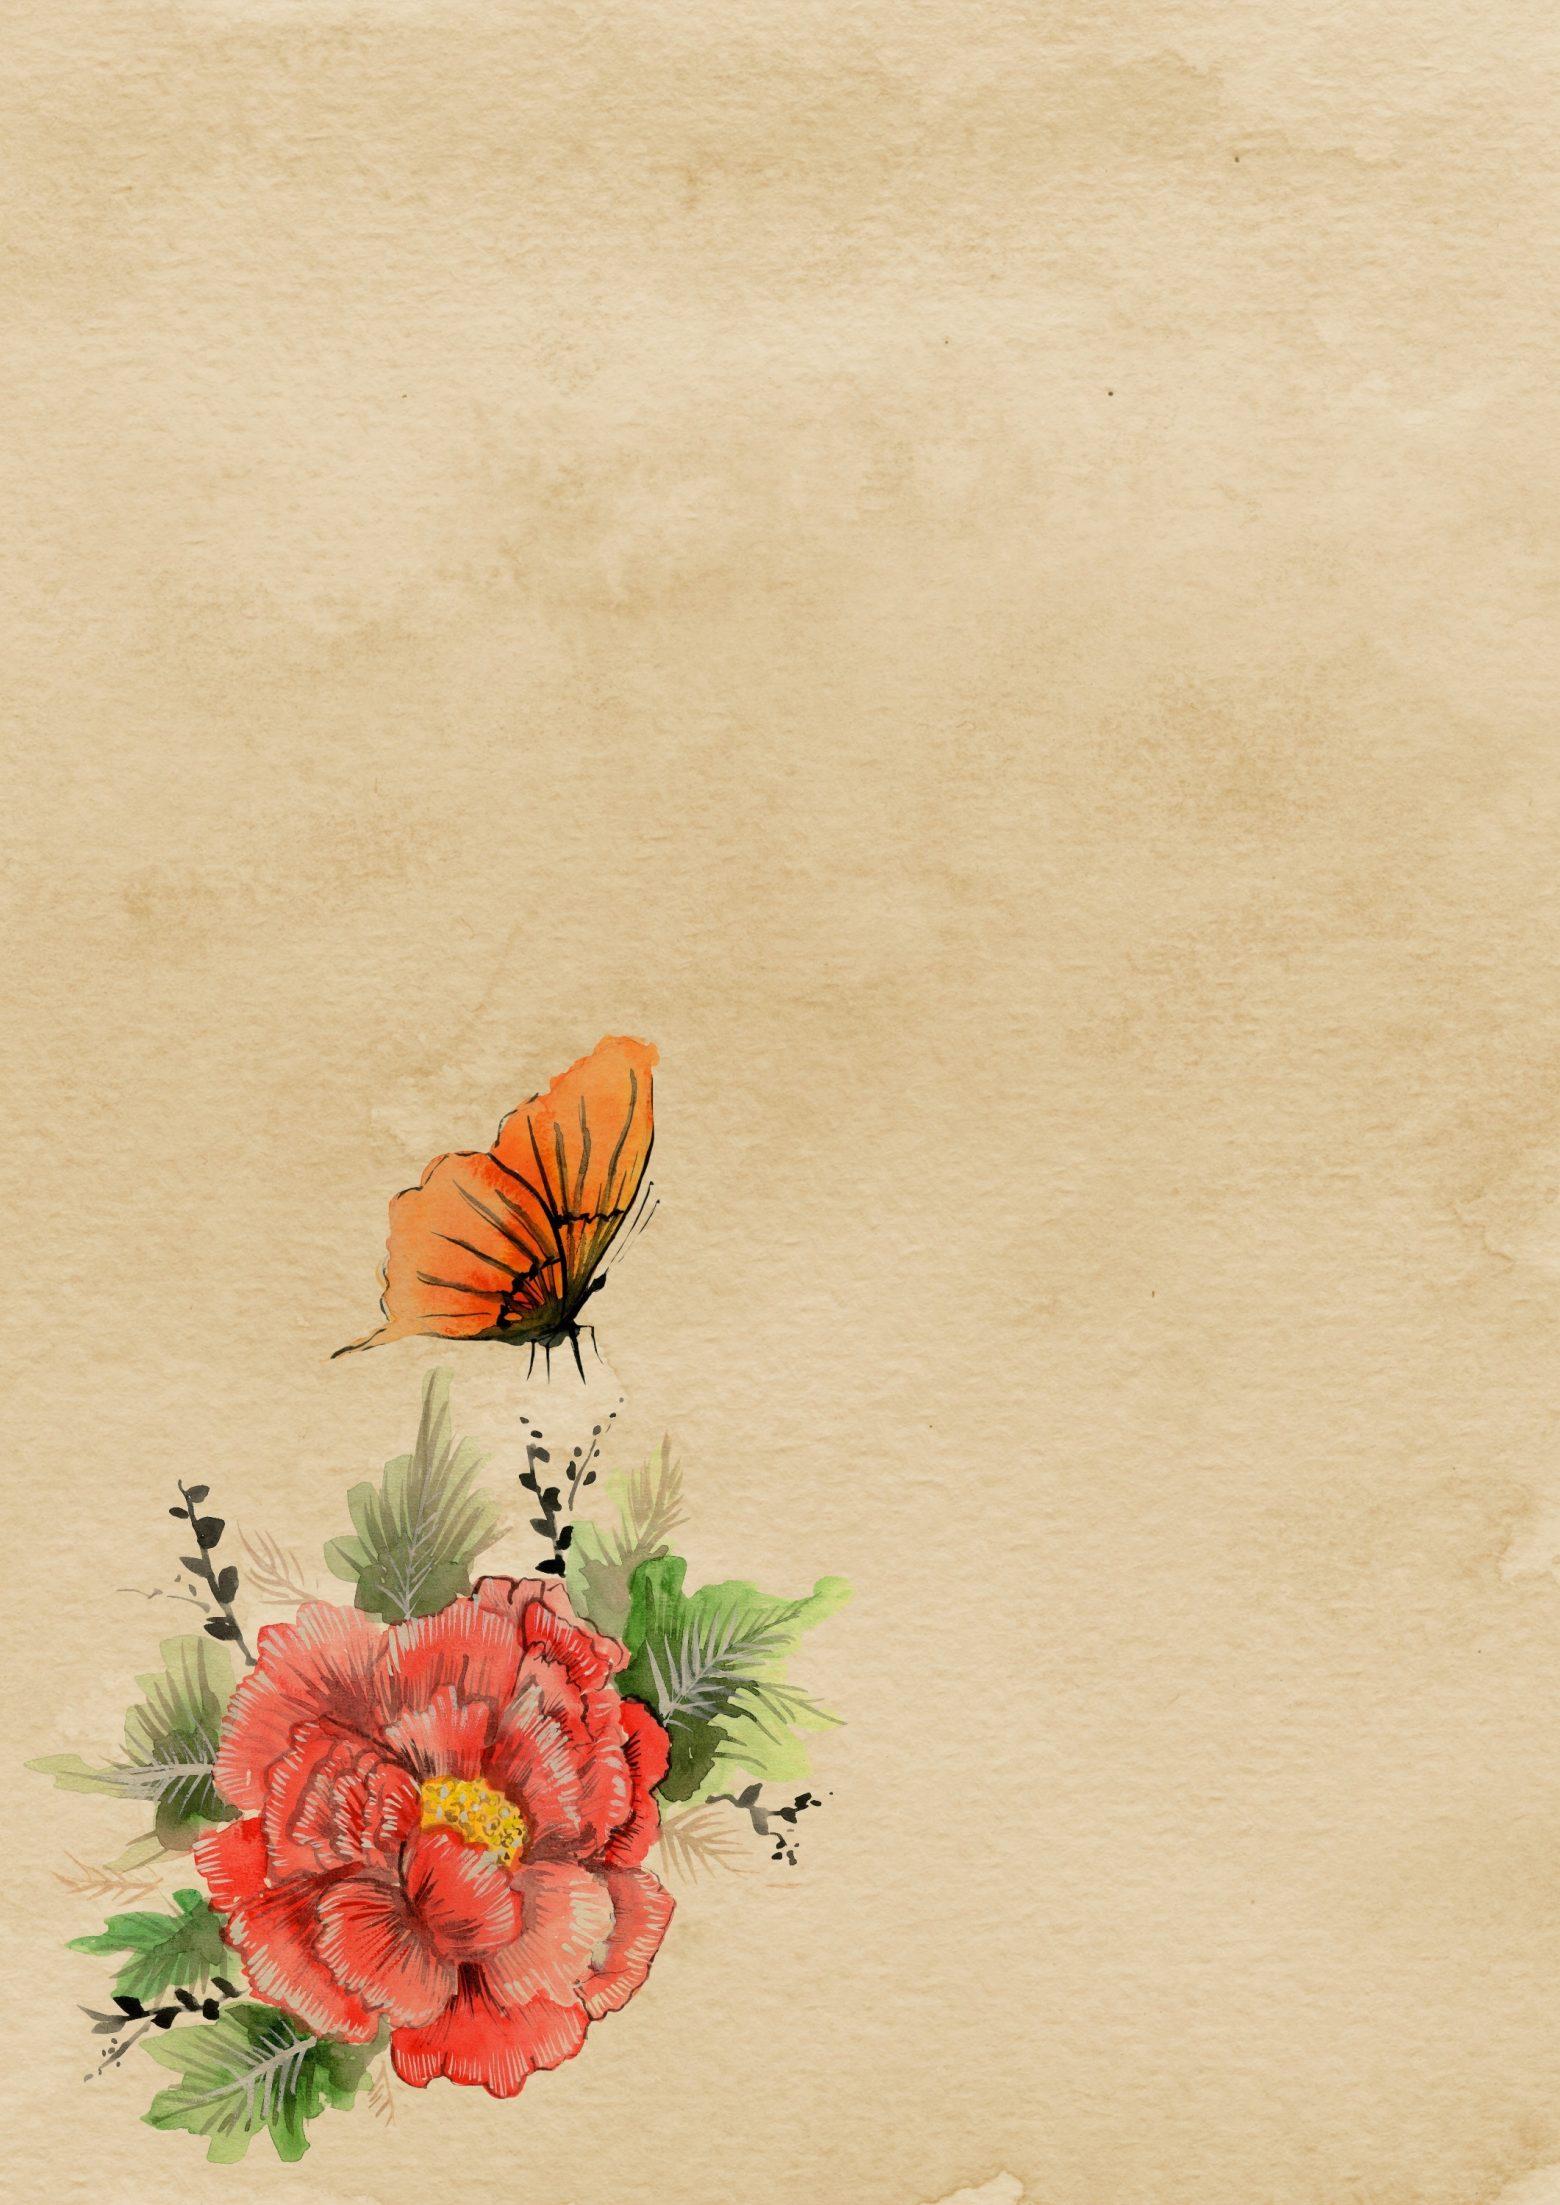 background-1424764